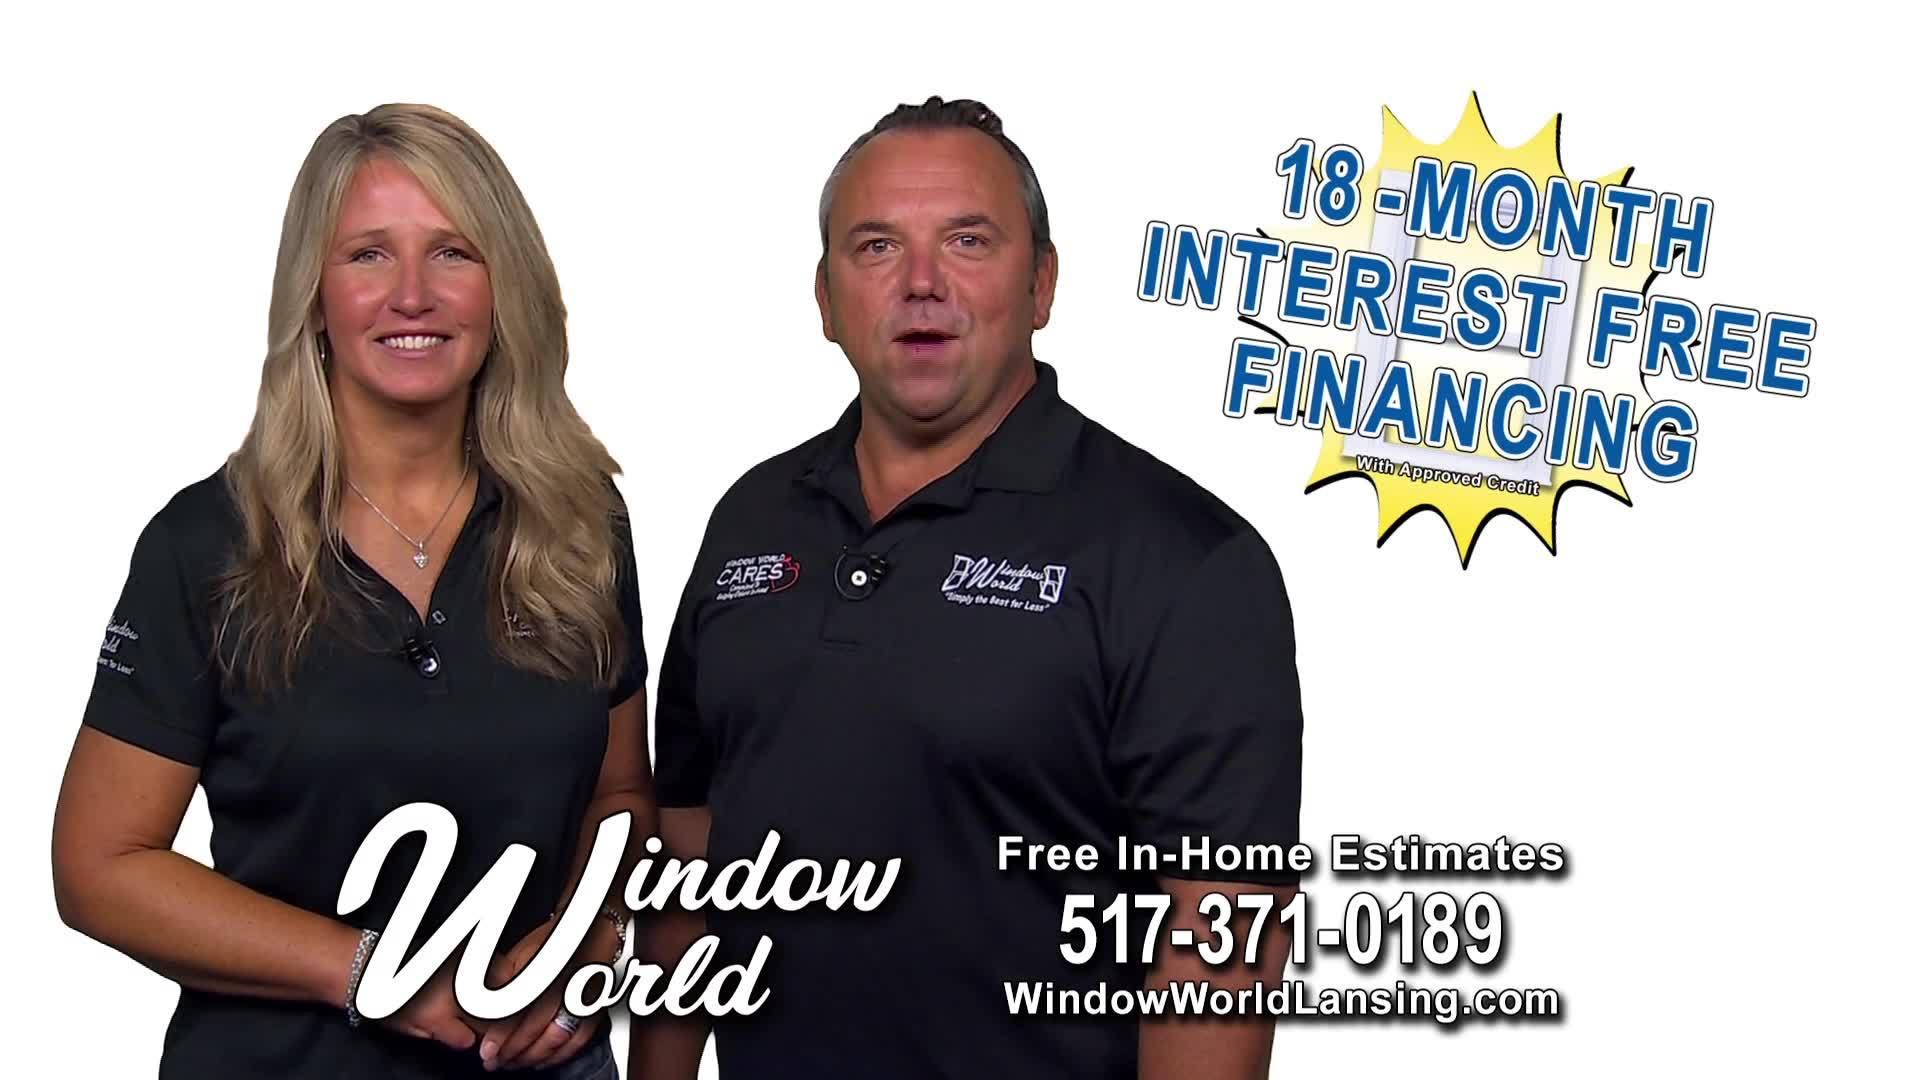 Window World | Interest Free Financing